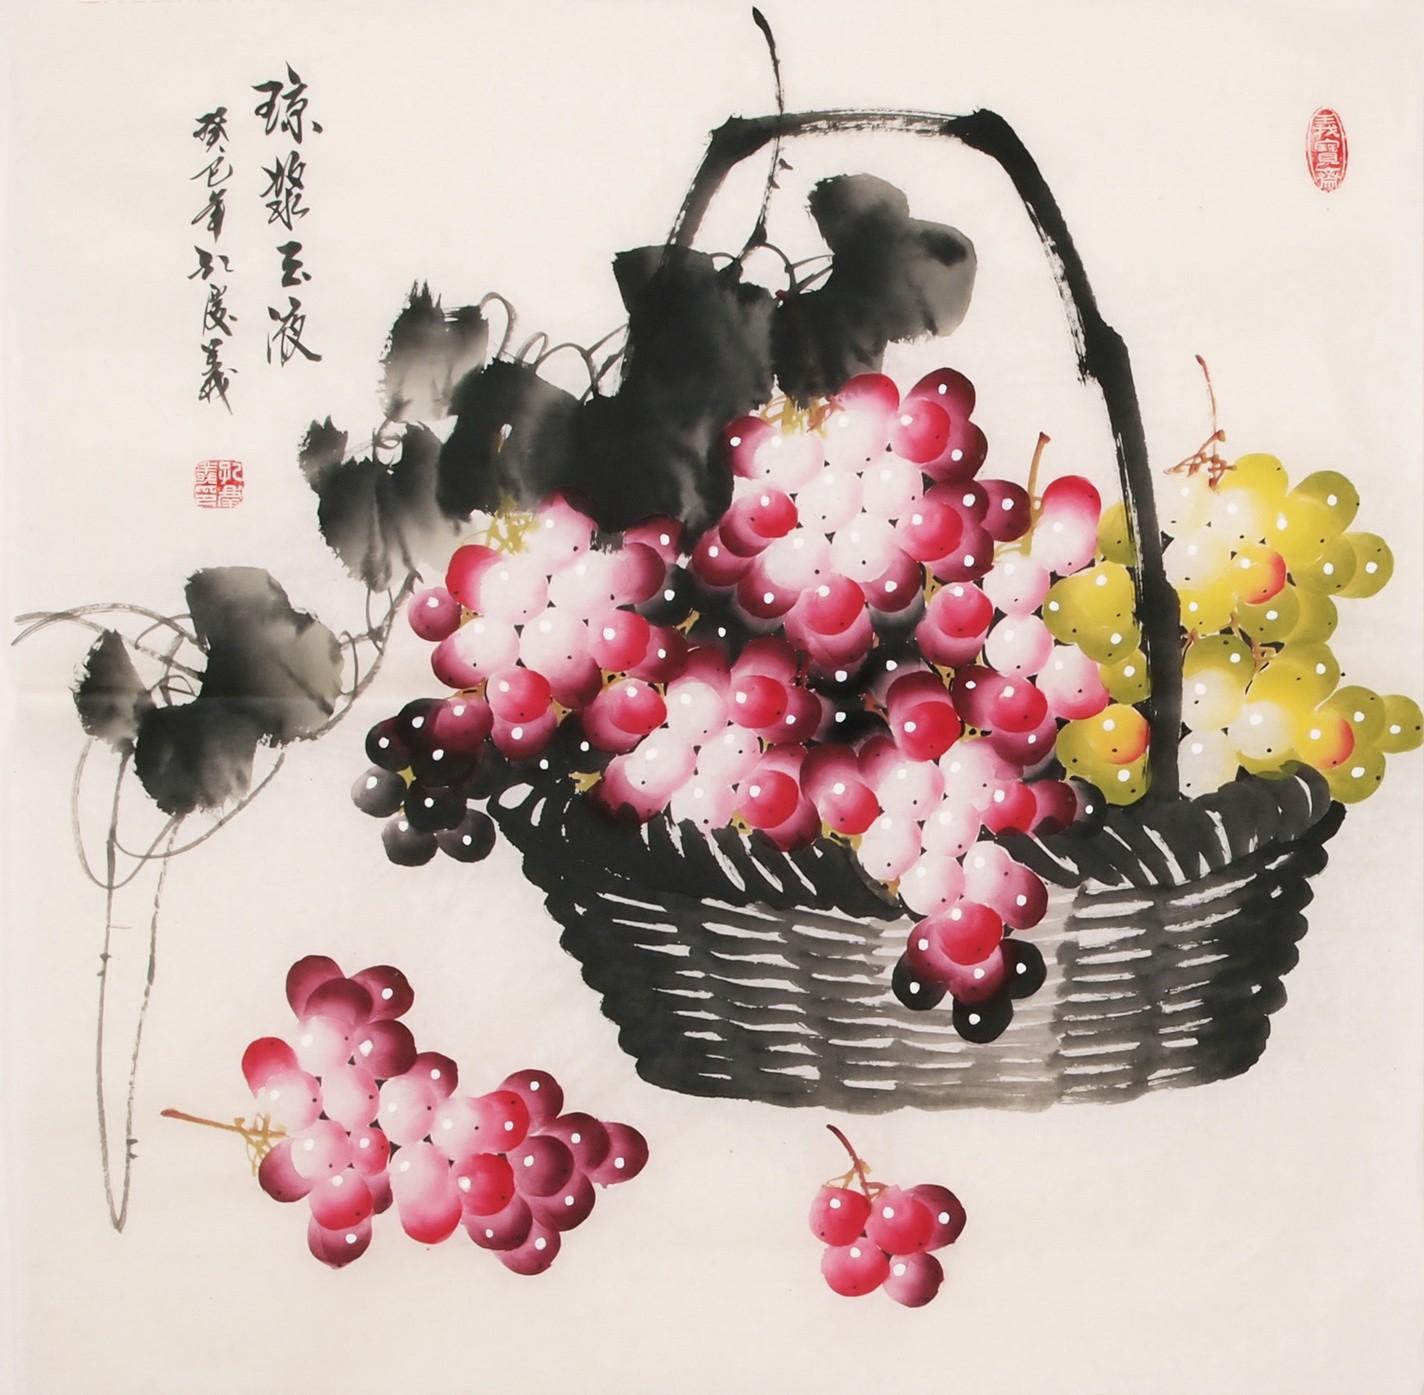 Grapes - CNAG005662